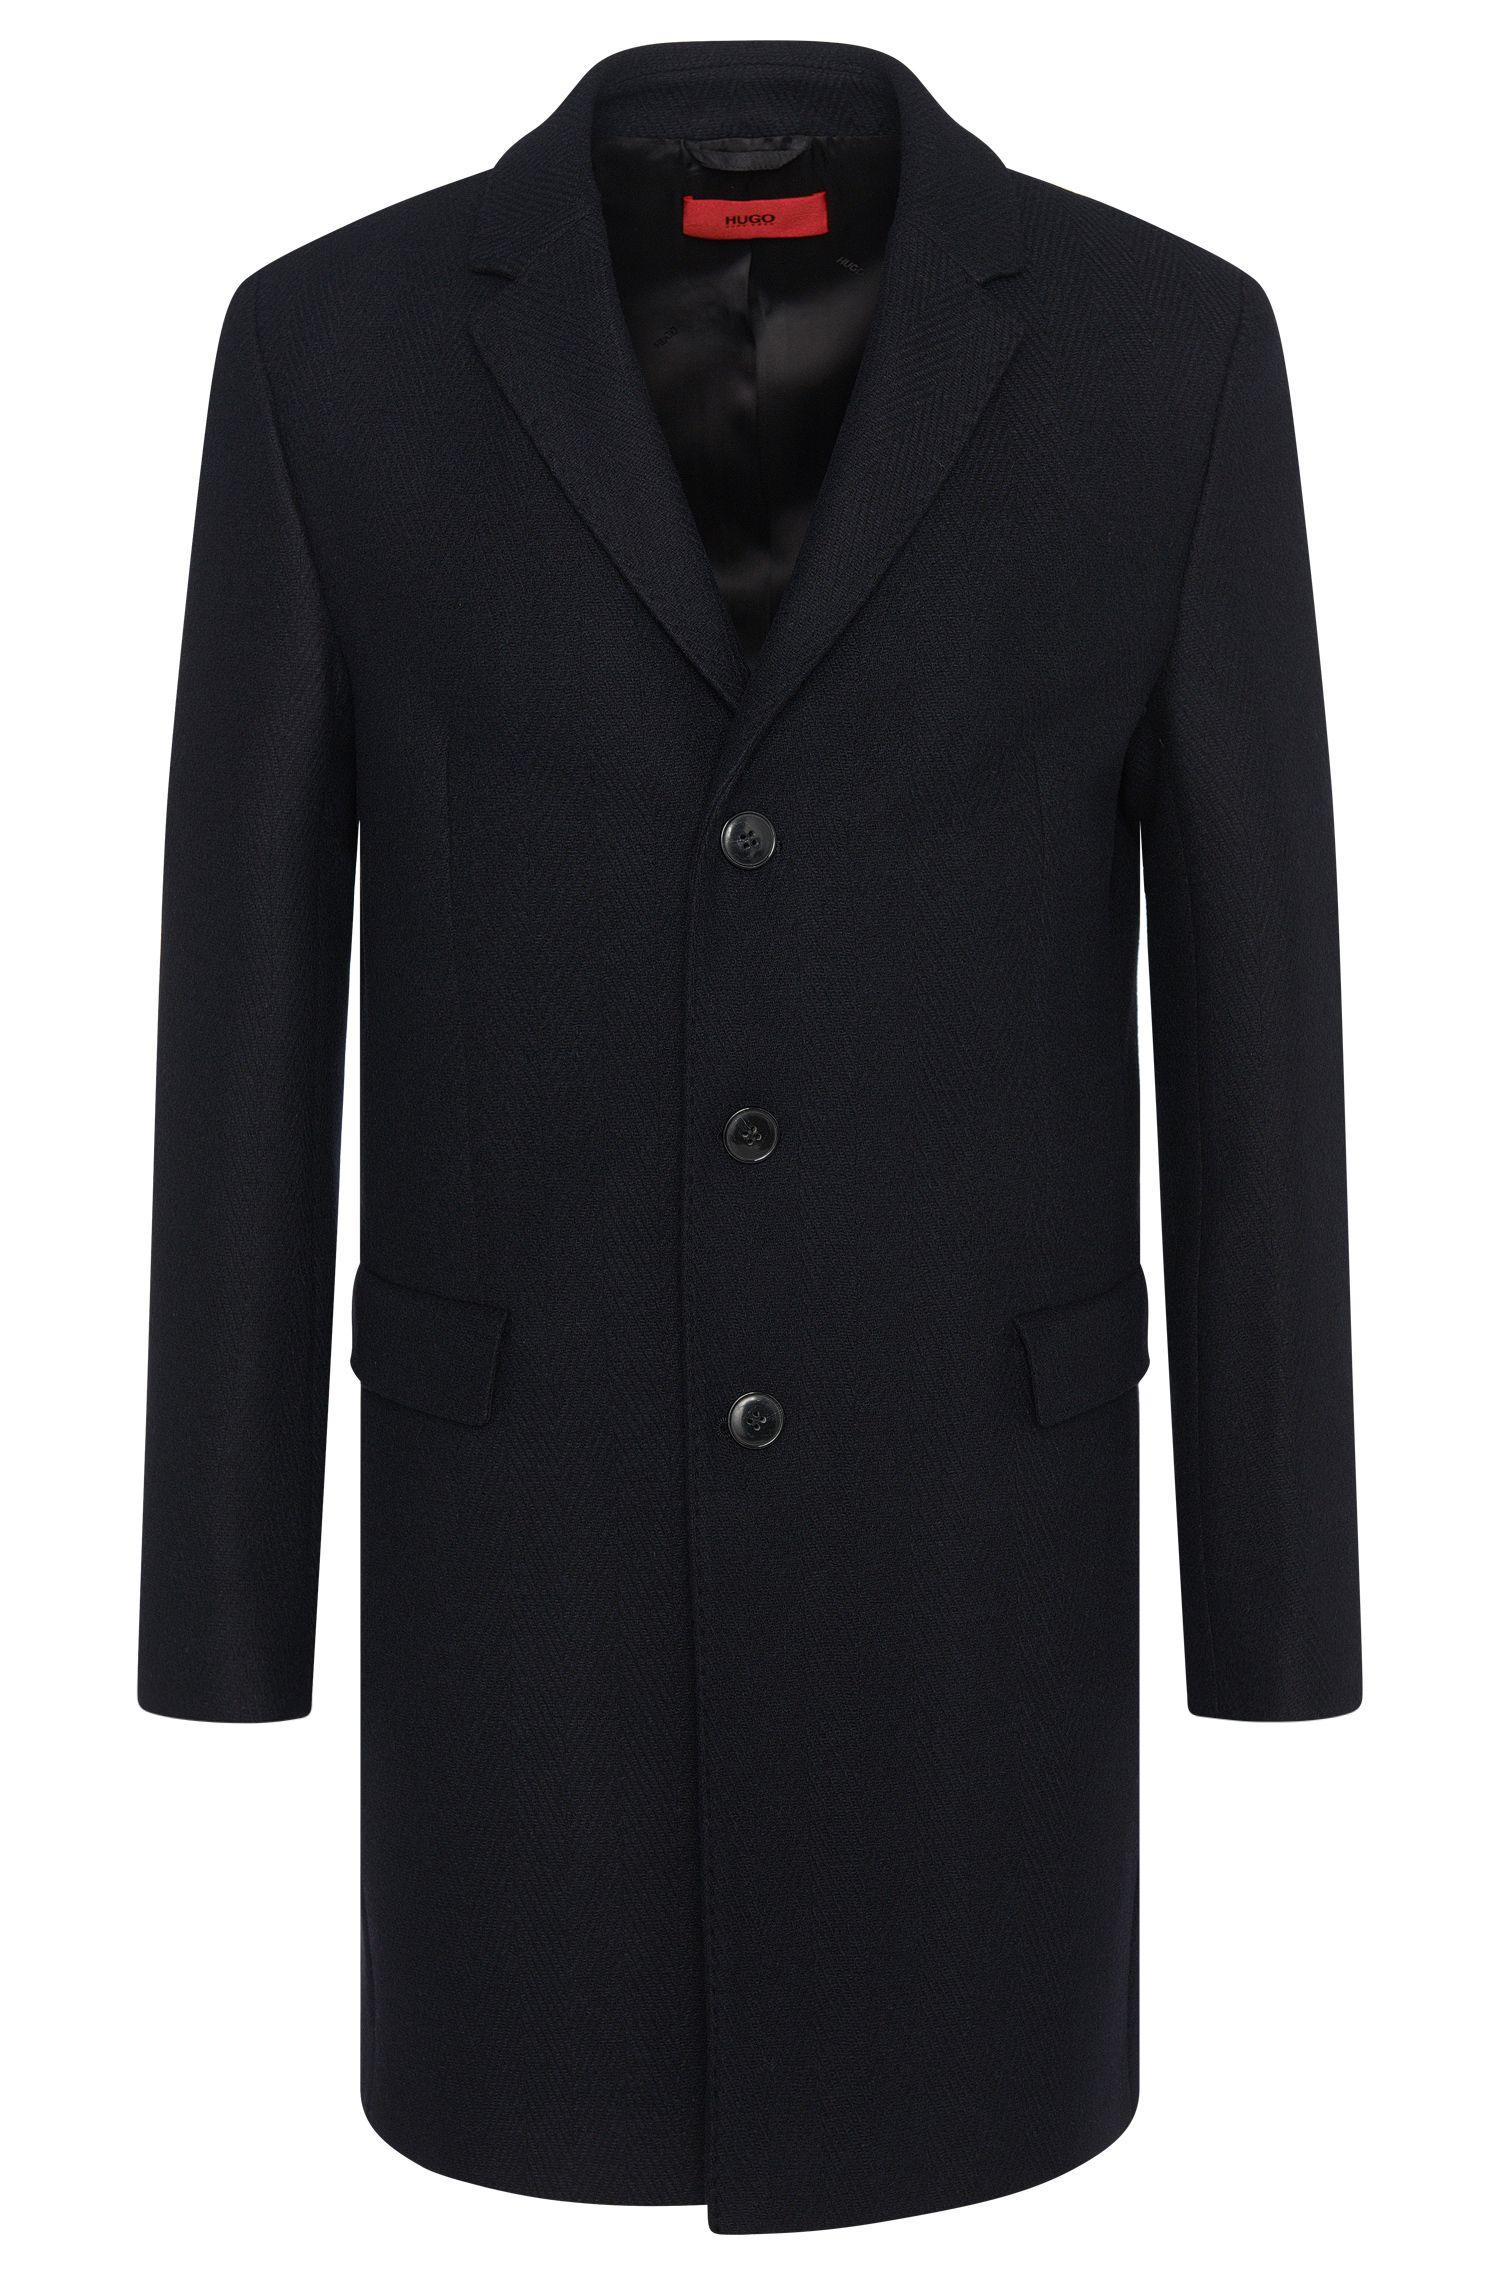 'Migor' | Herringbone Wool Blend Coat